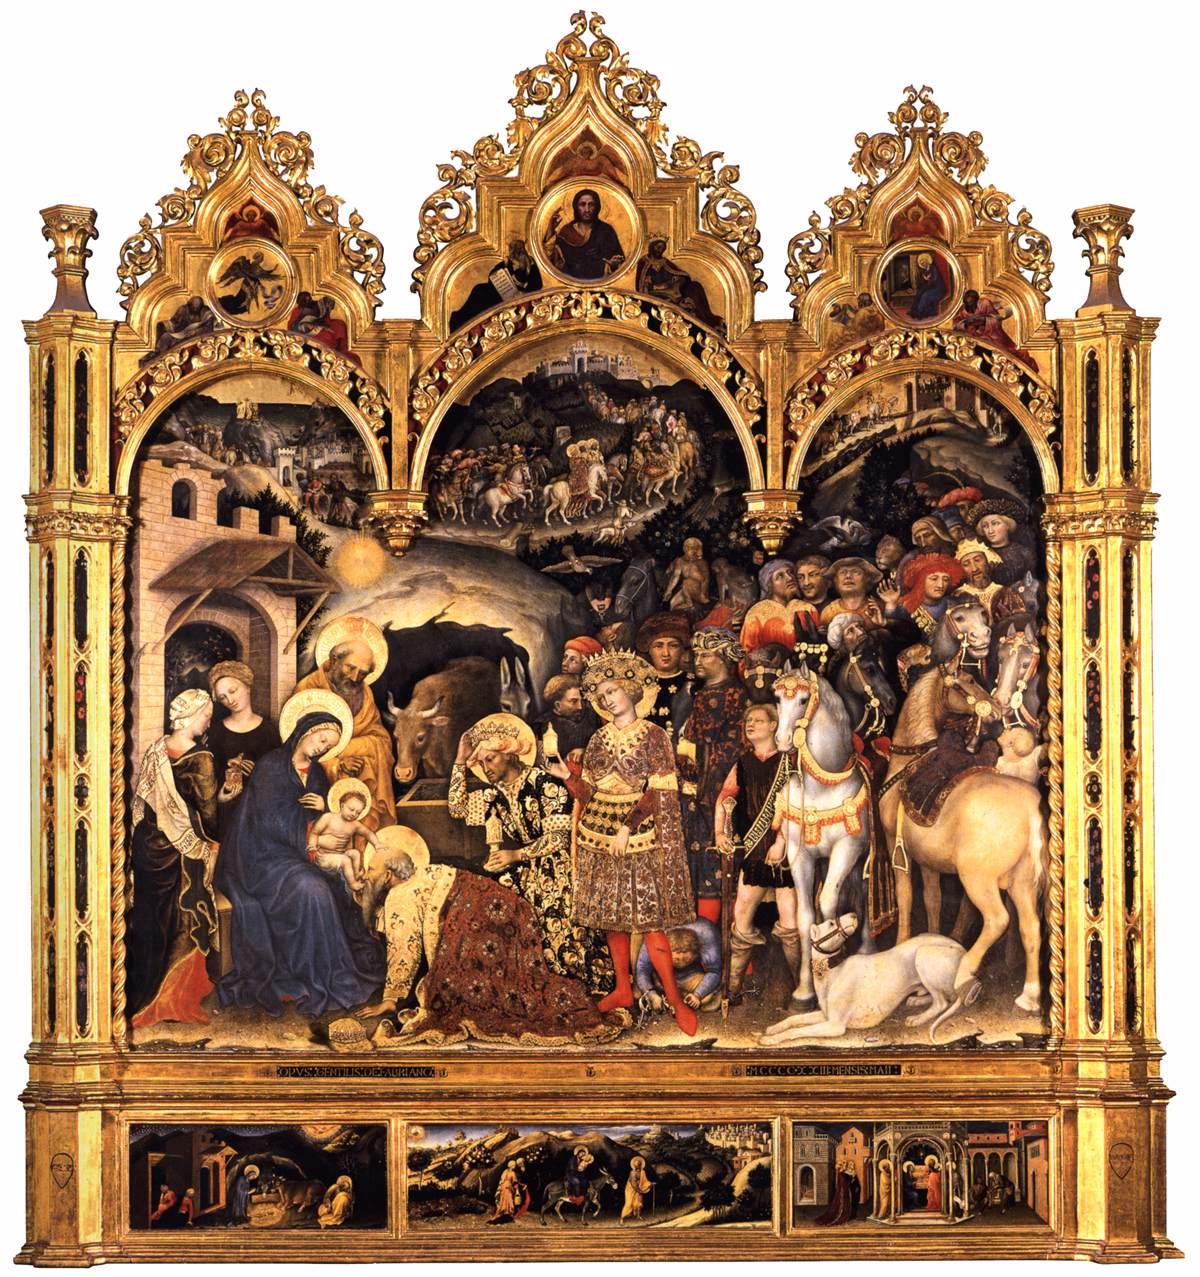 Gentile da Fabriano, Aanbidding der Wijzen, 1423, Galleria degli Uffizi, Florence